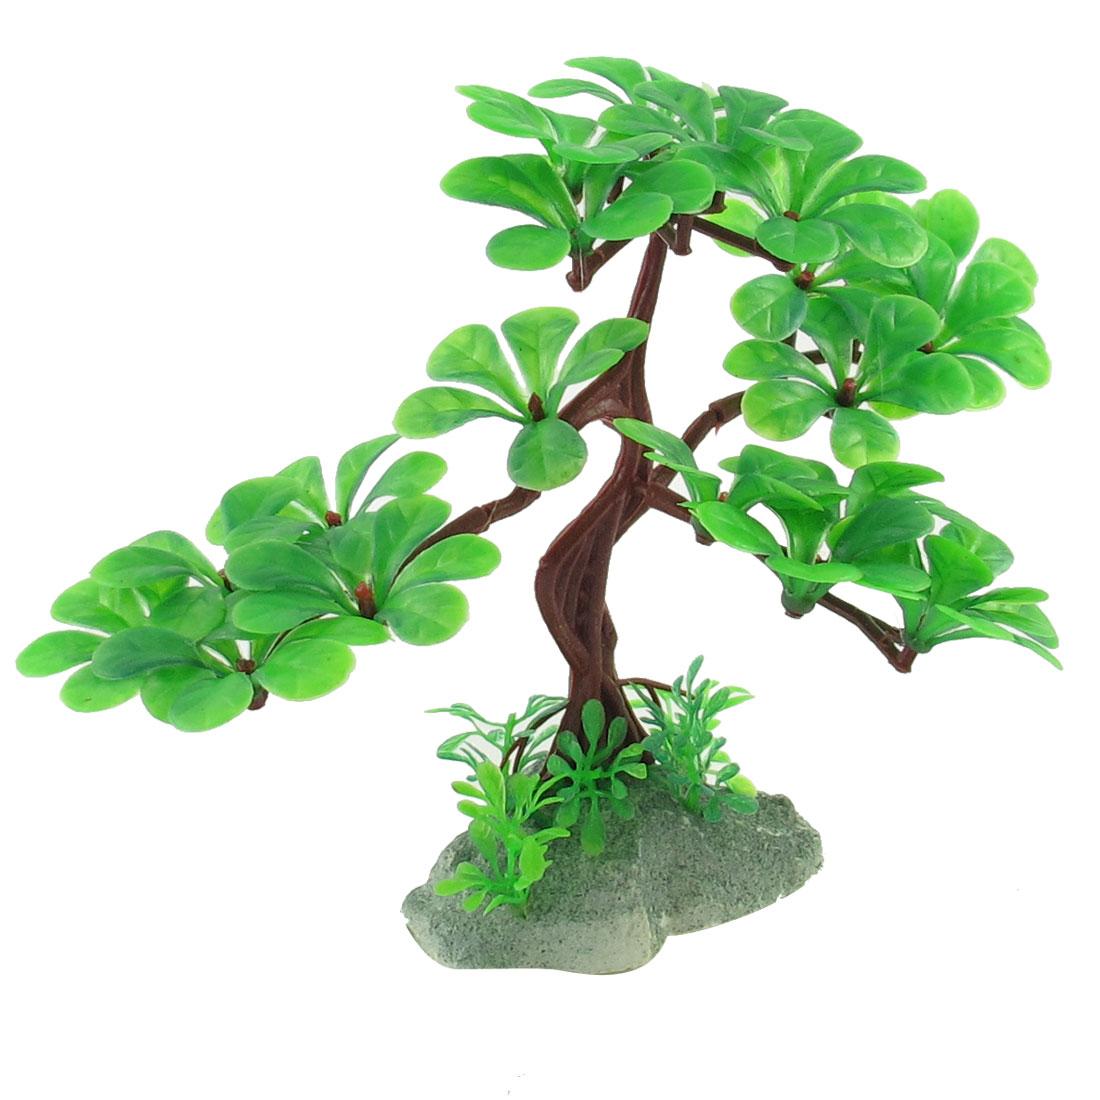 "6.1"" Height Emulational Green Aquarium Underwater Tree Plants for Fish Tank"